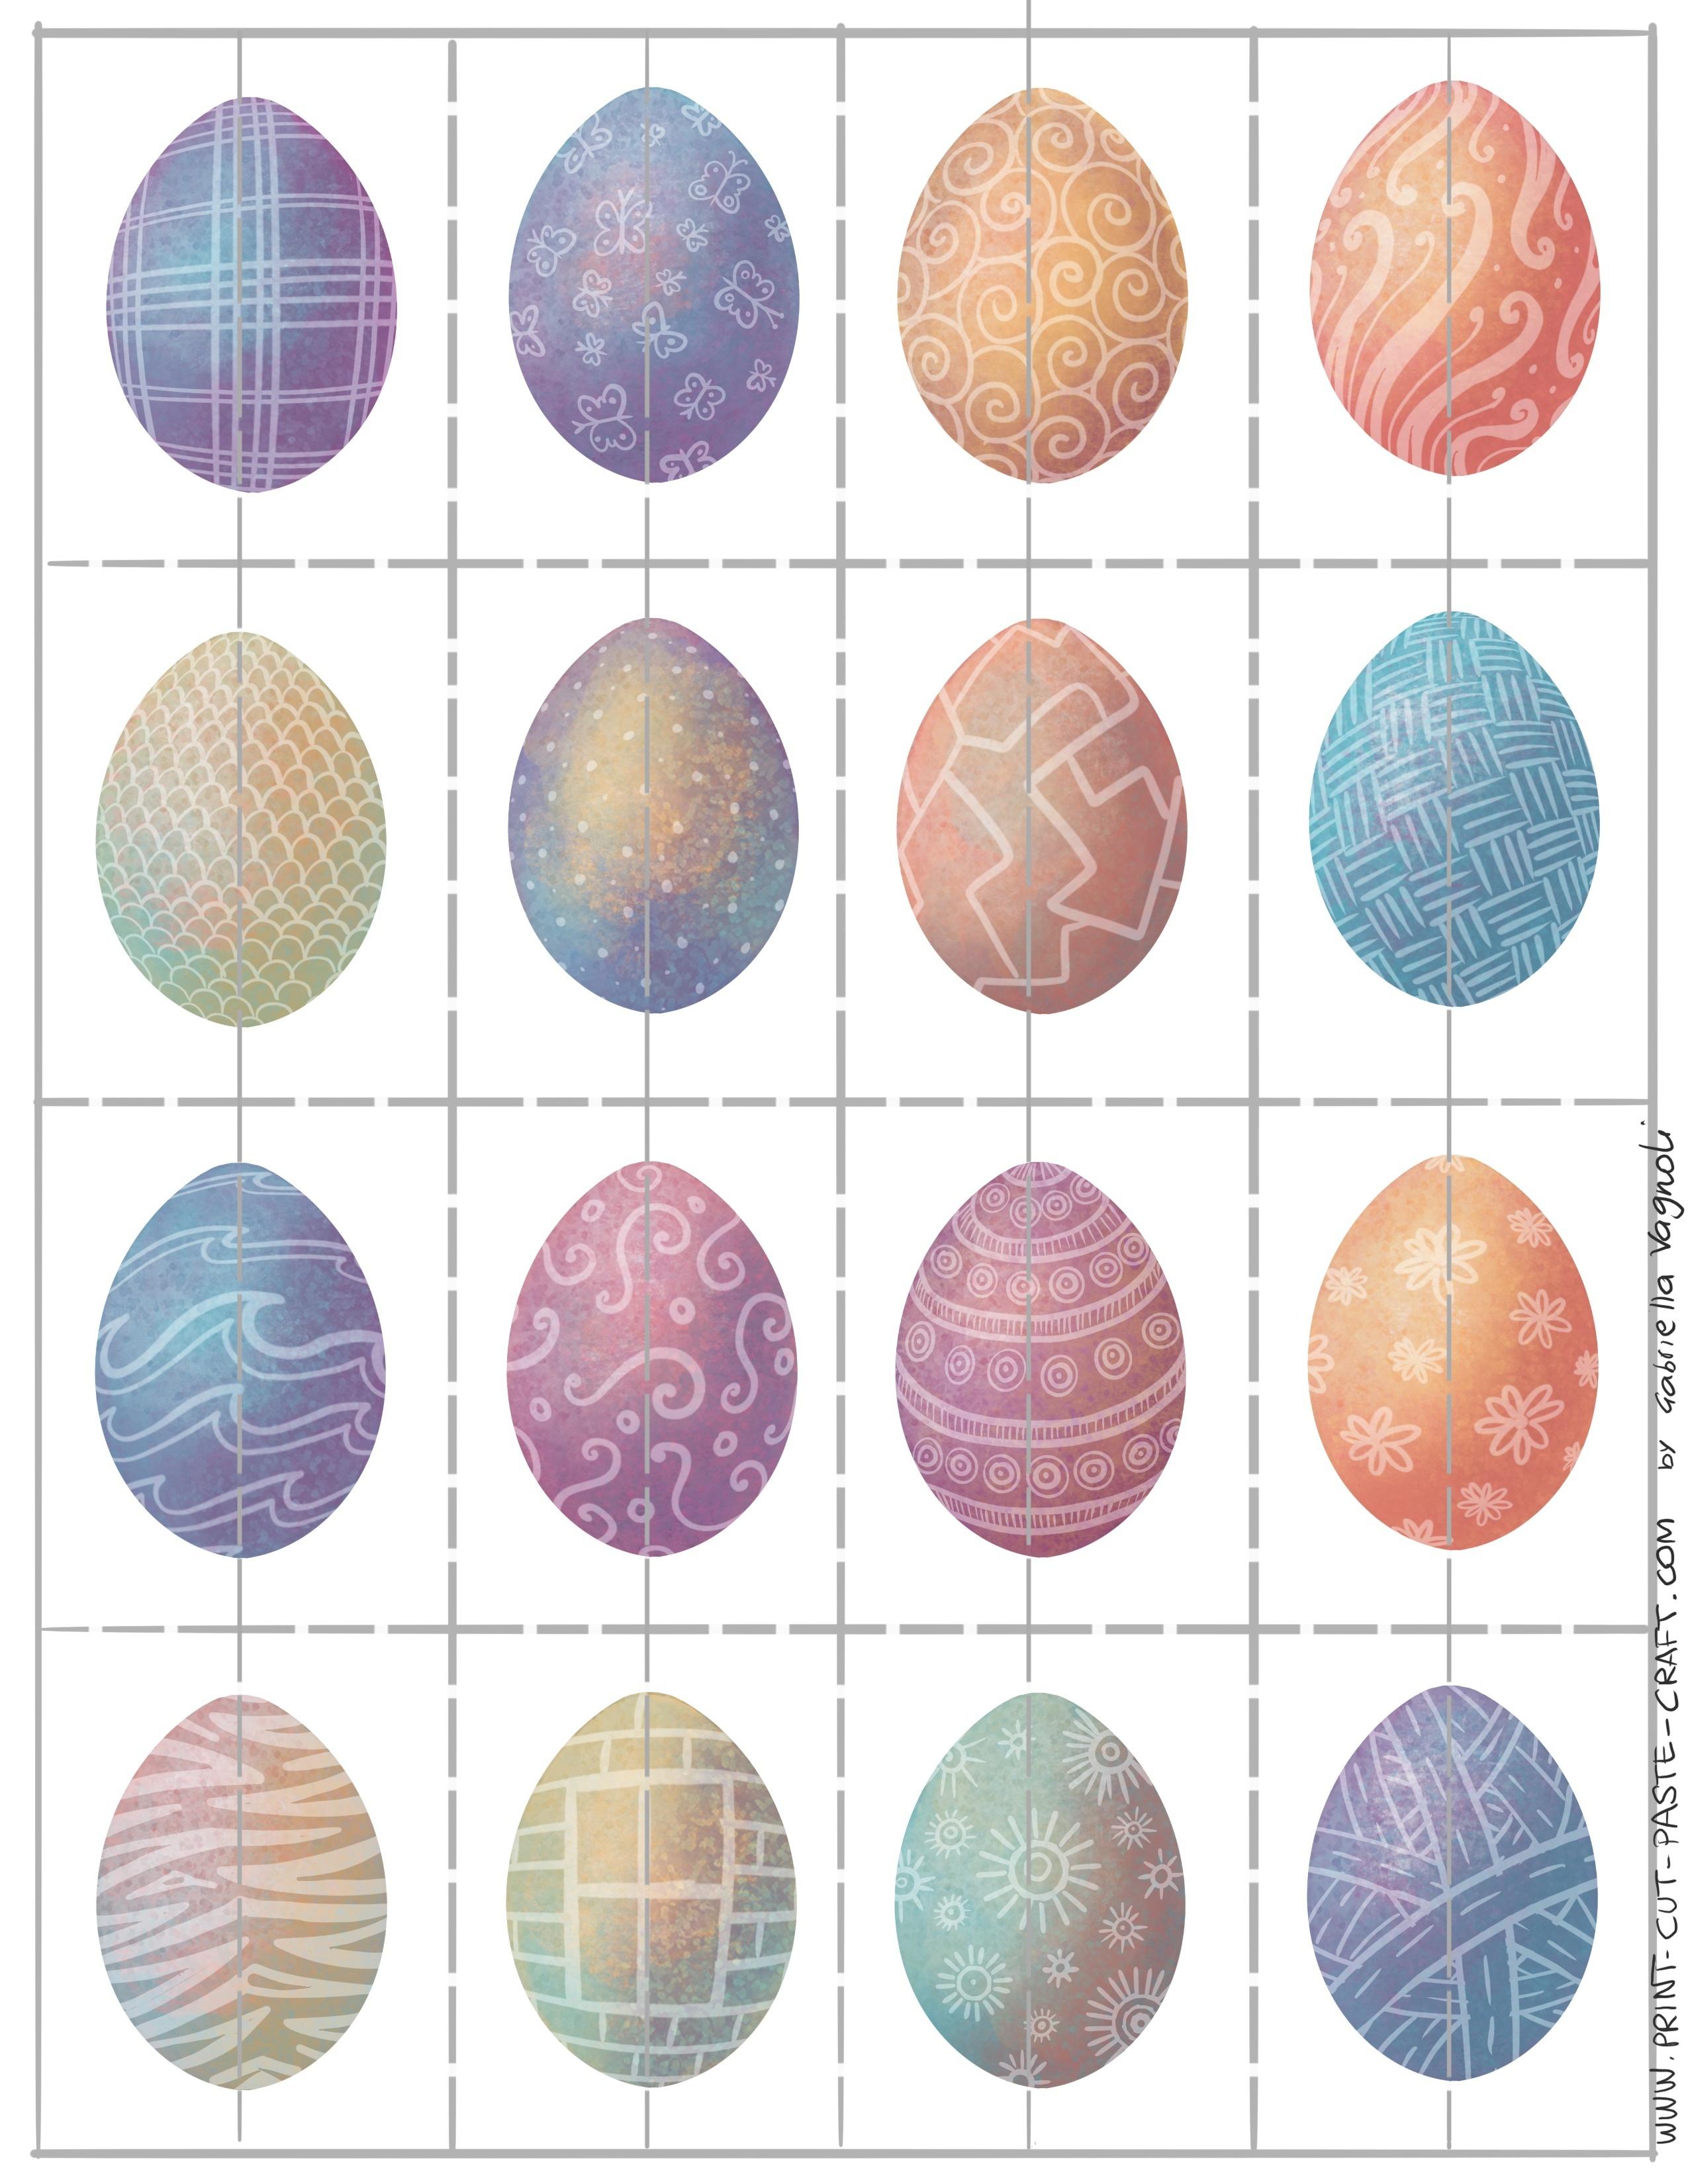 Free Printable Easter Egg Matching Game | Print, Cut, Paste, Craft! - Free Printable Matching Cards